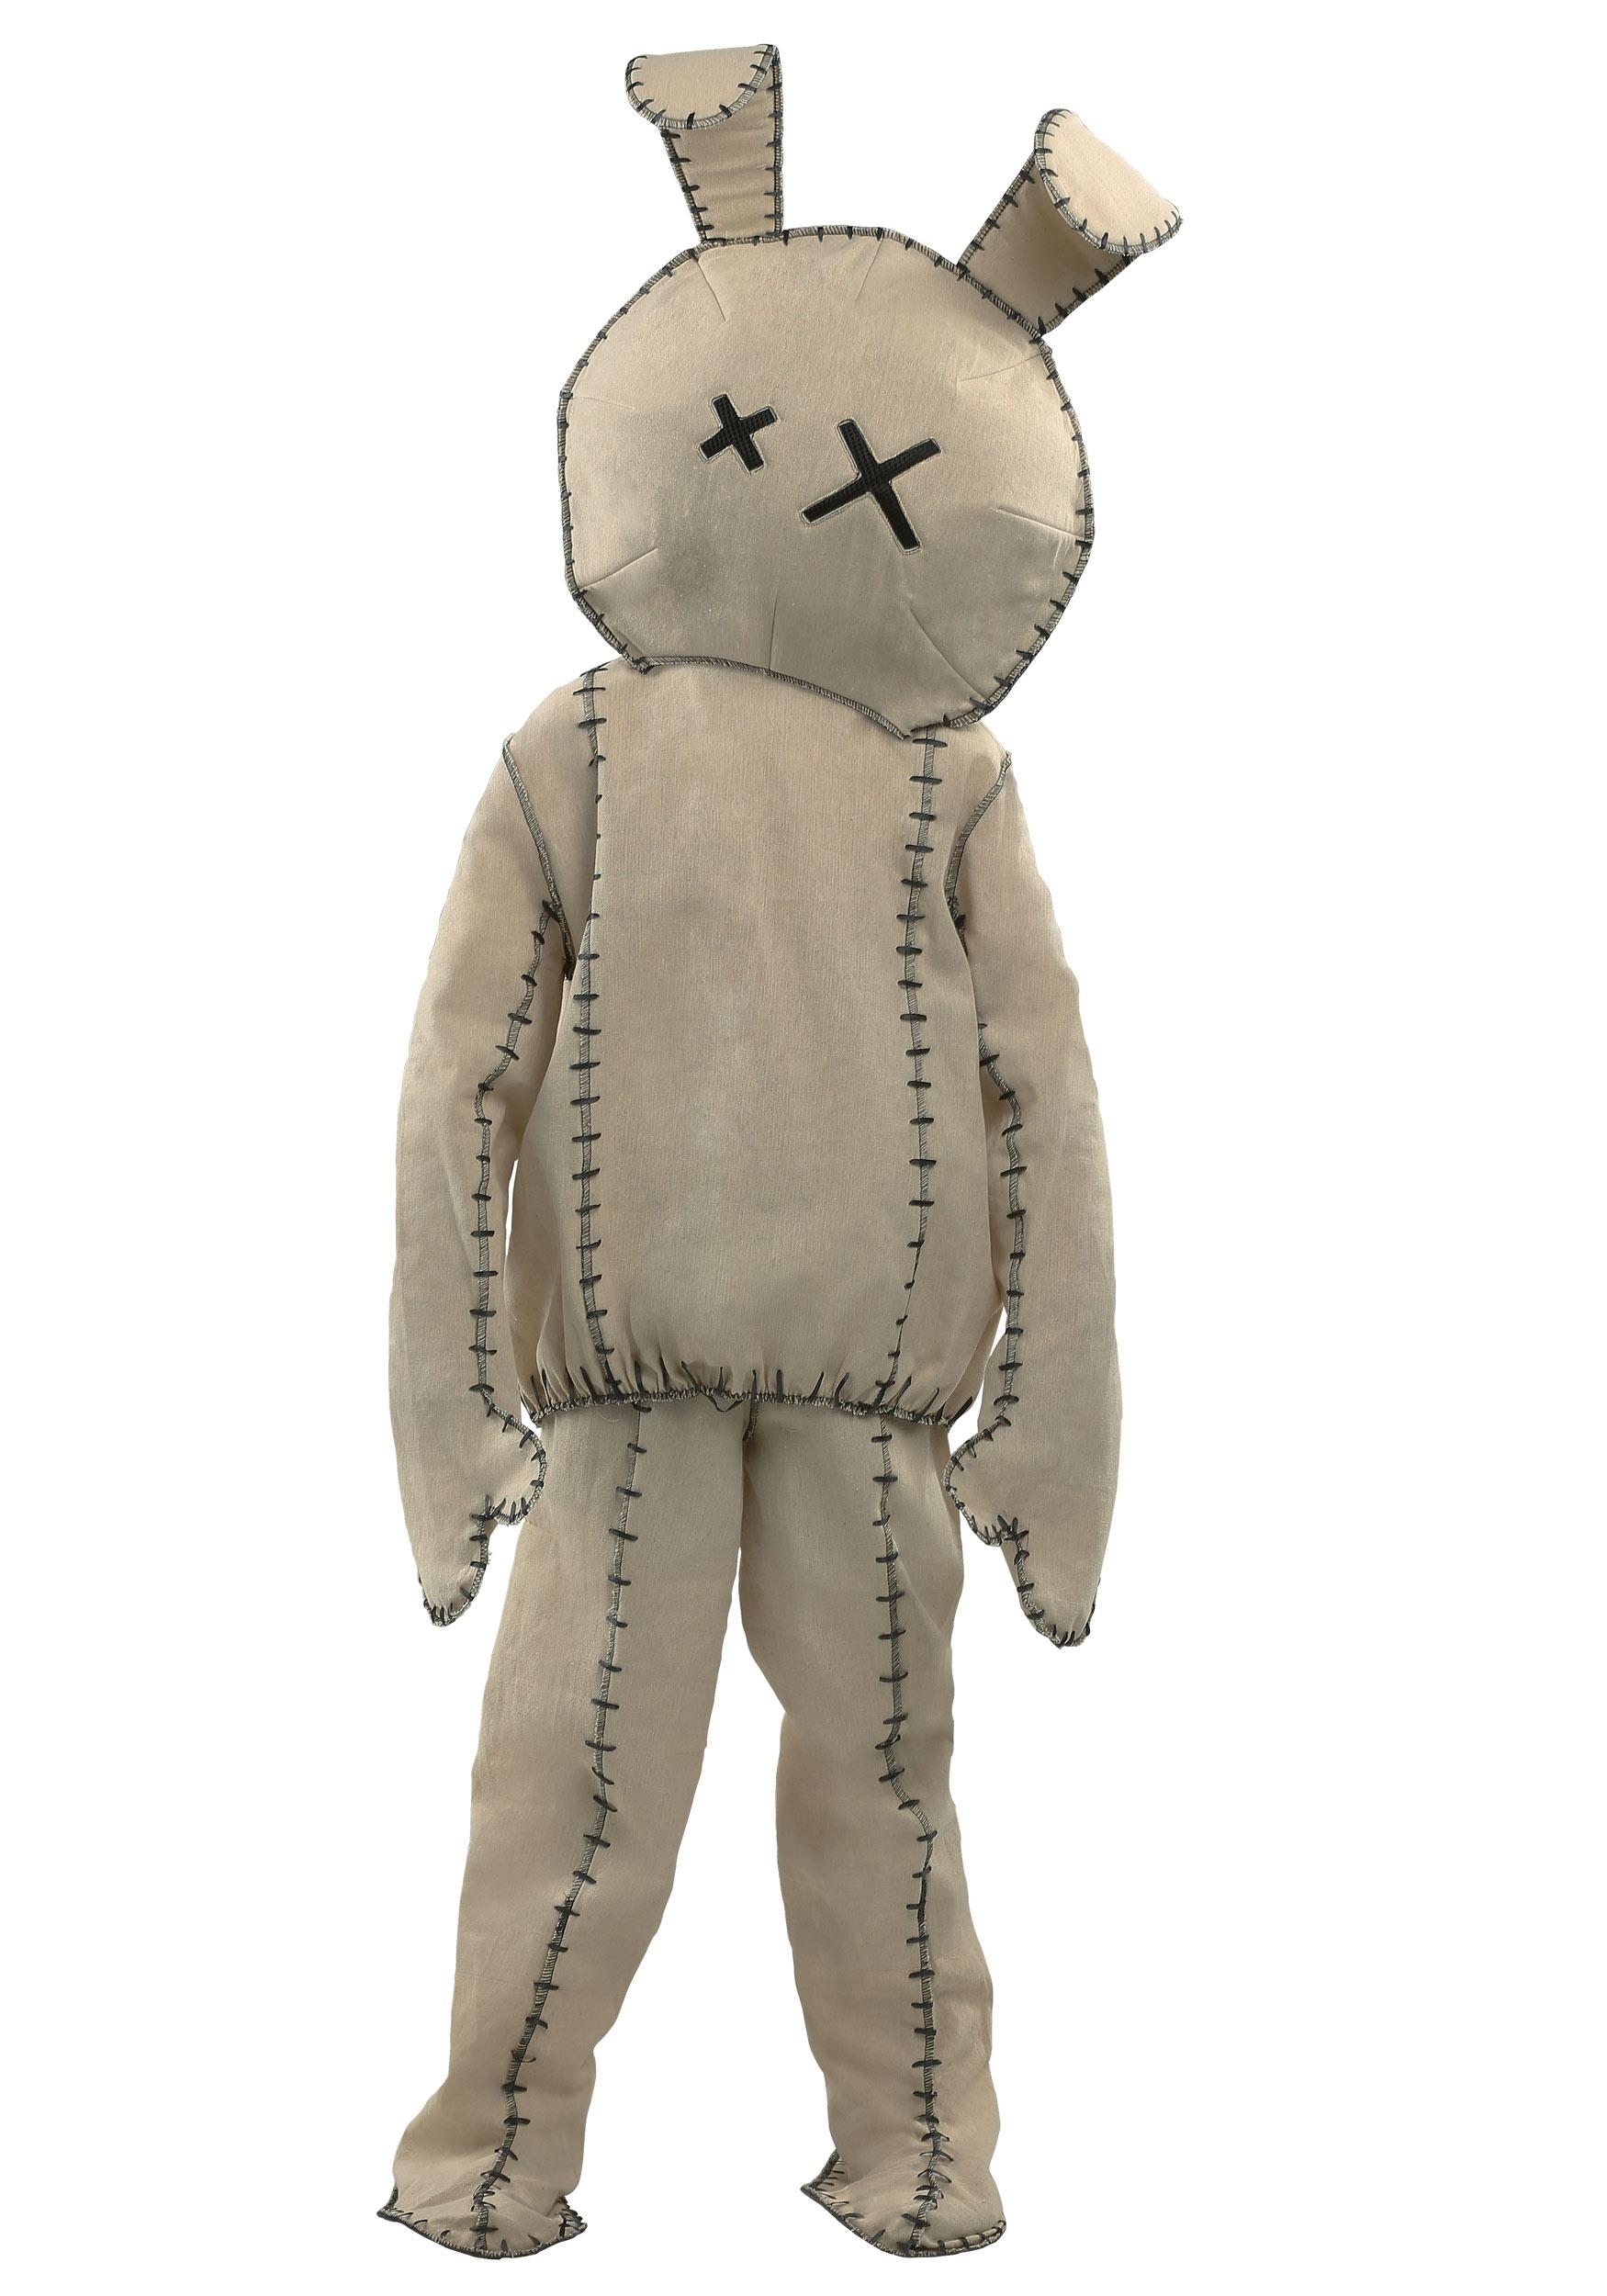 Lifeless Bunny Costume for Kids